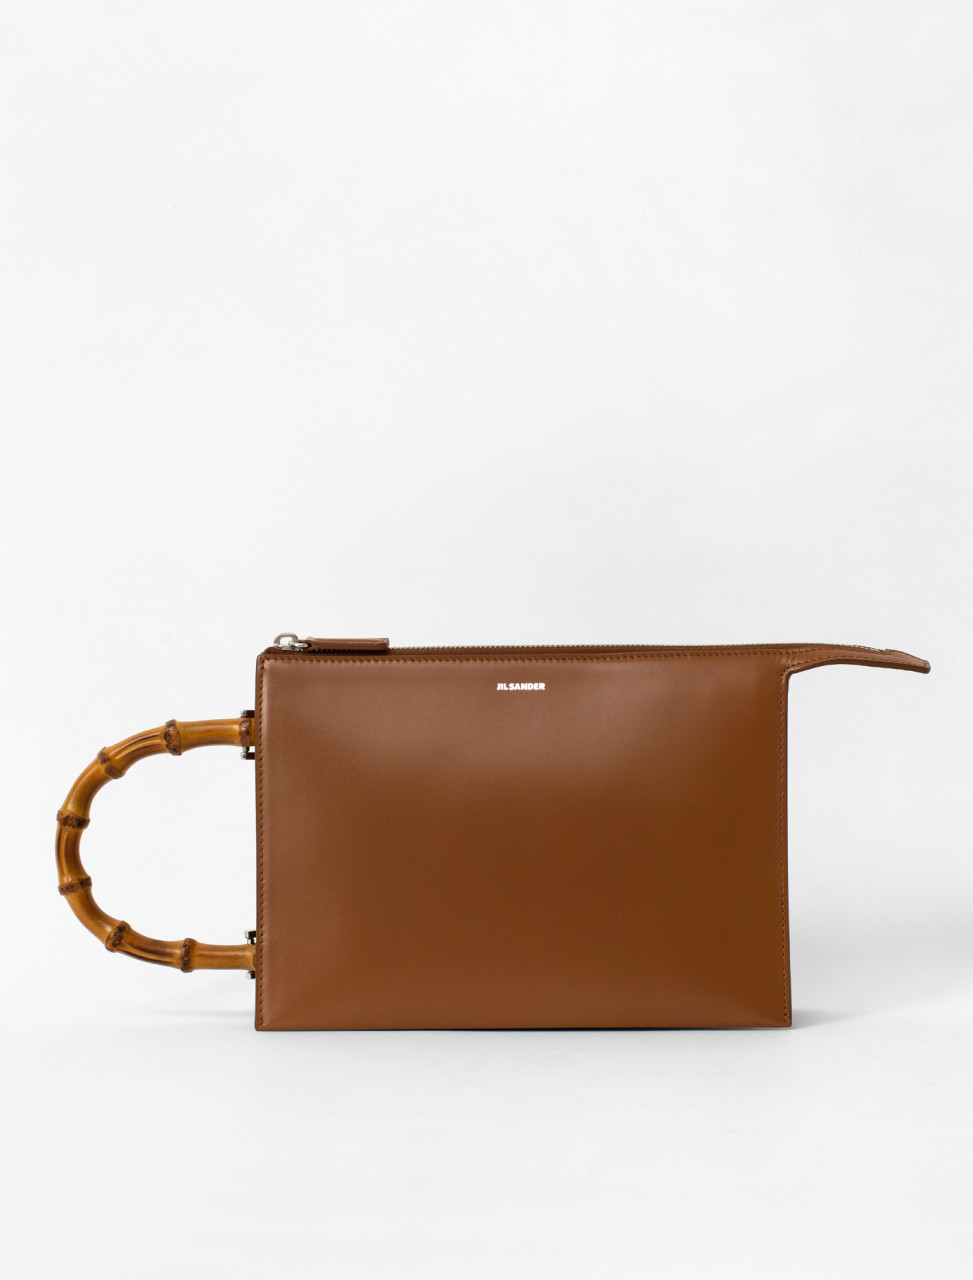 Bamboo Calfskin Bag Small